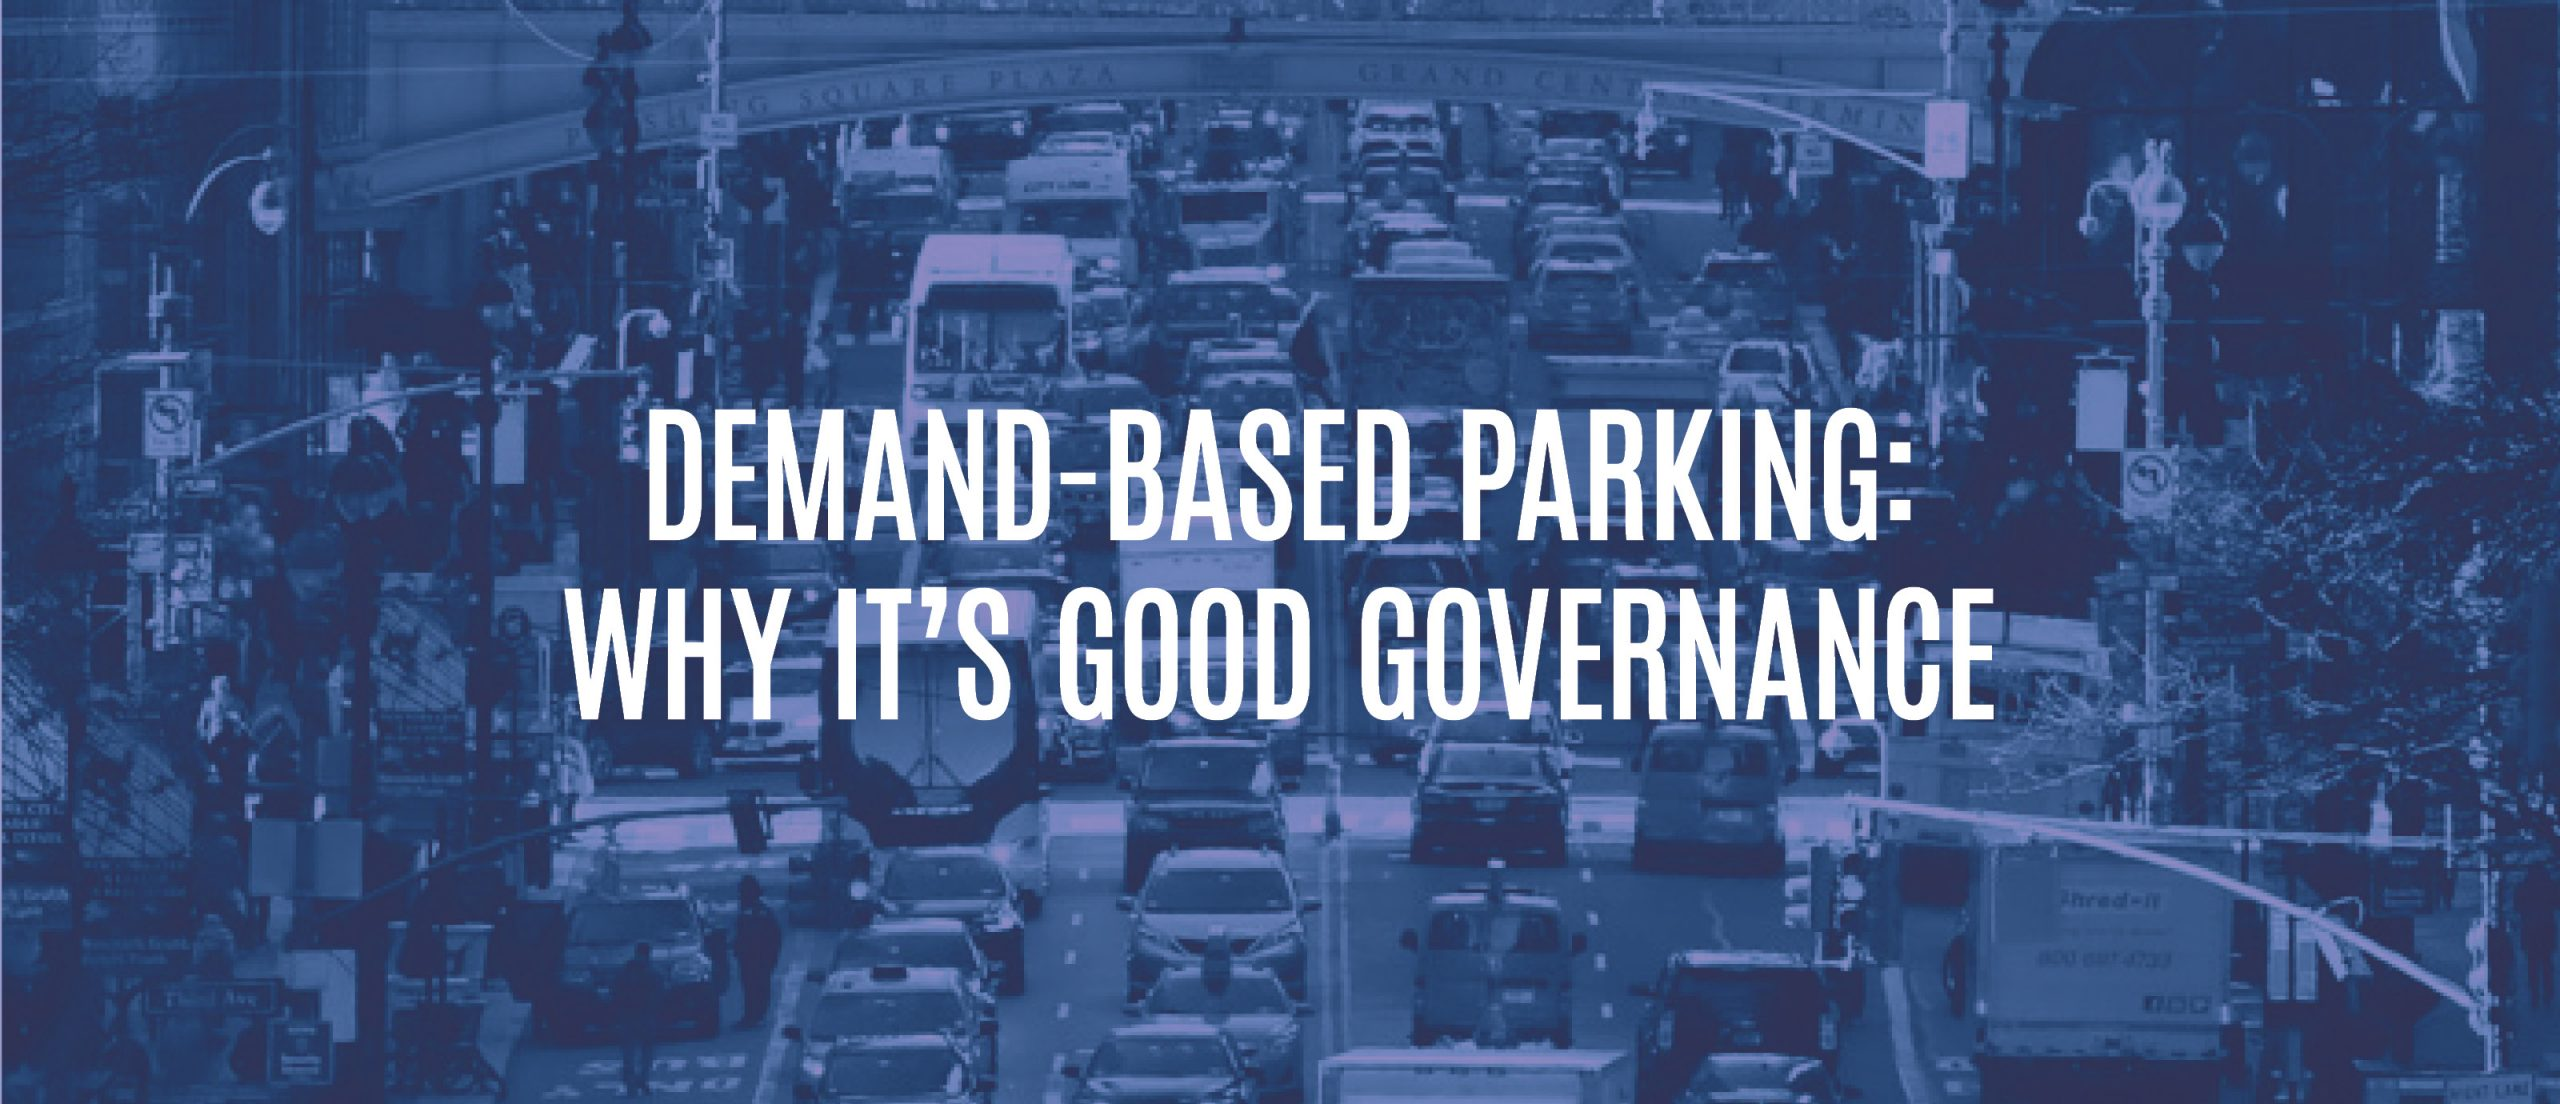 Blog Title - Demand-based parking: why it's good governance